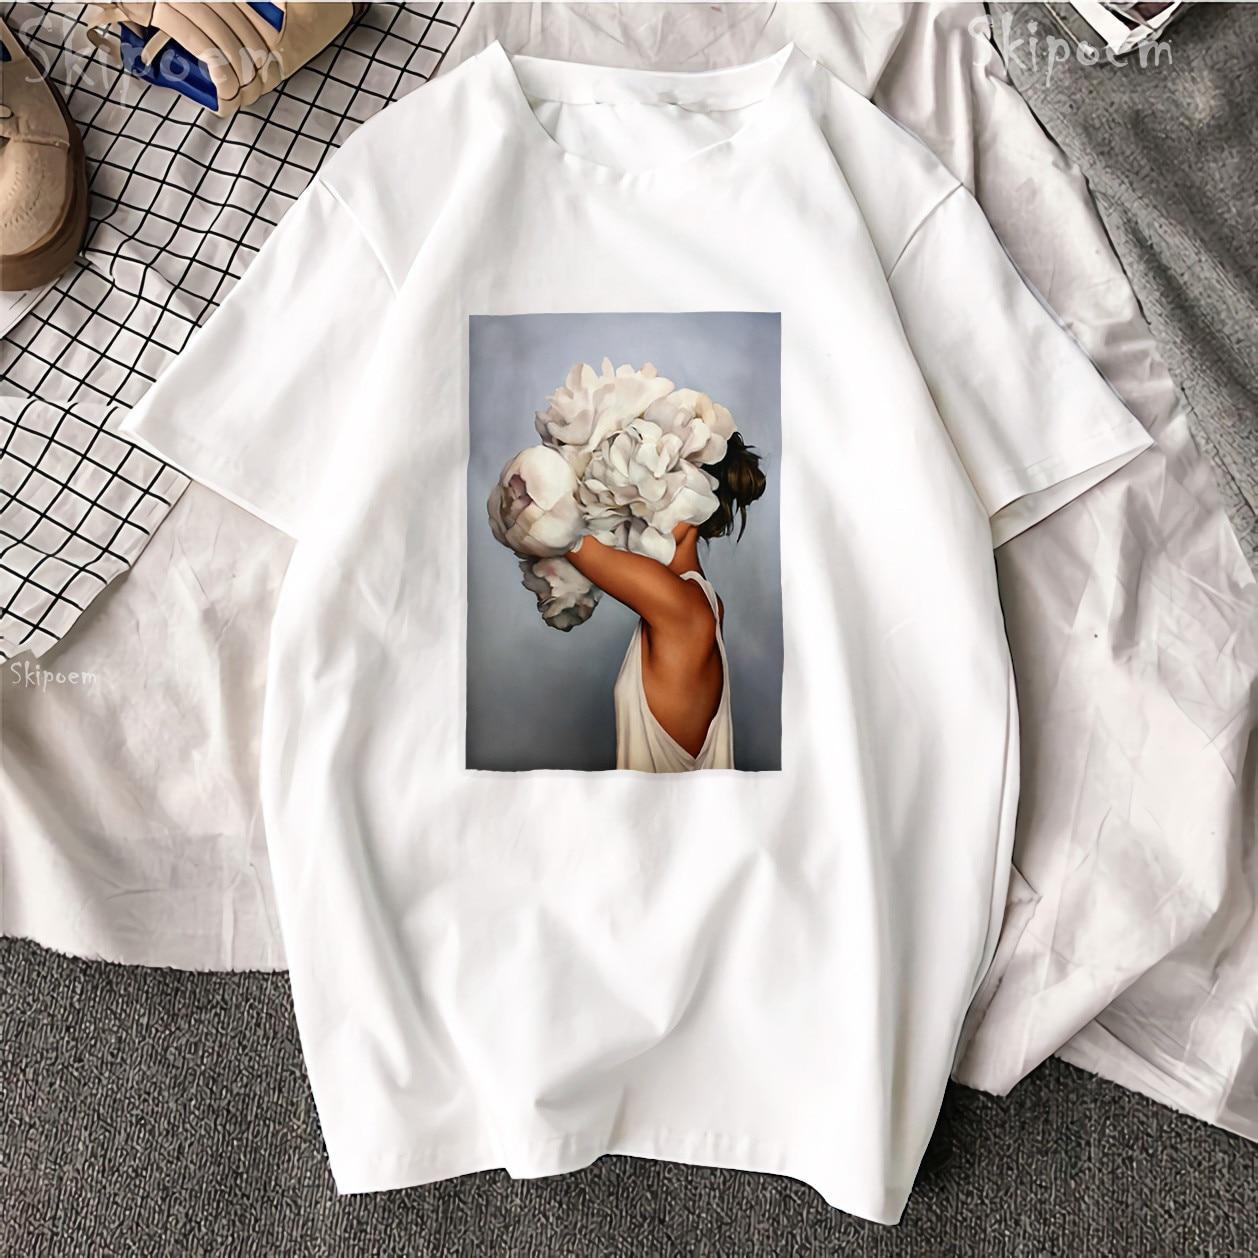 New Cotton Harajuku Aesthetics Tshirt Sexy Flowers Feather Print Short Sleeve Tops & Tees Fashion Casual Couple T Shirt